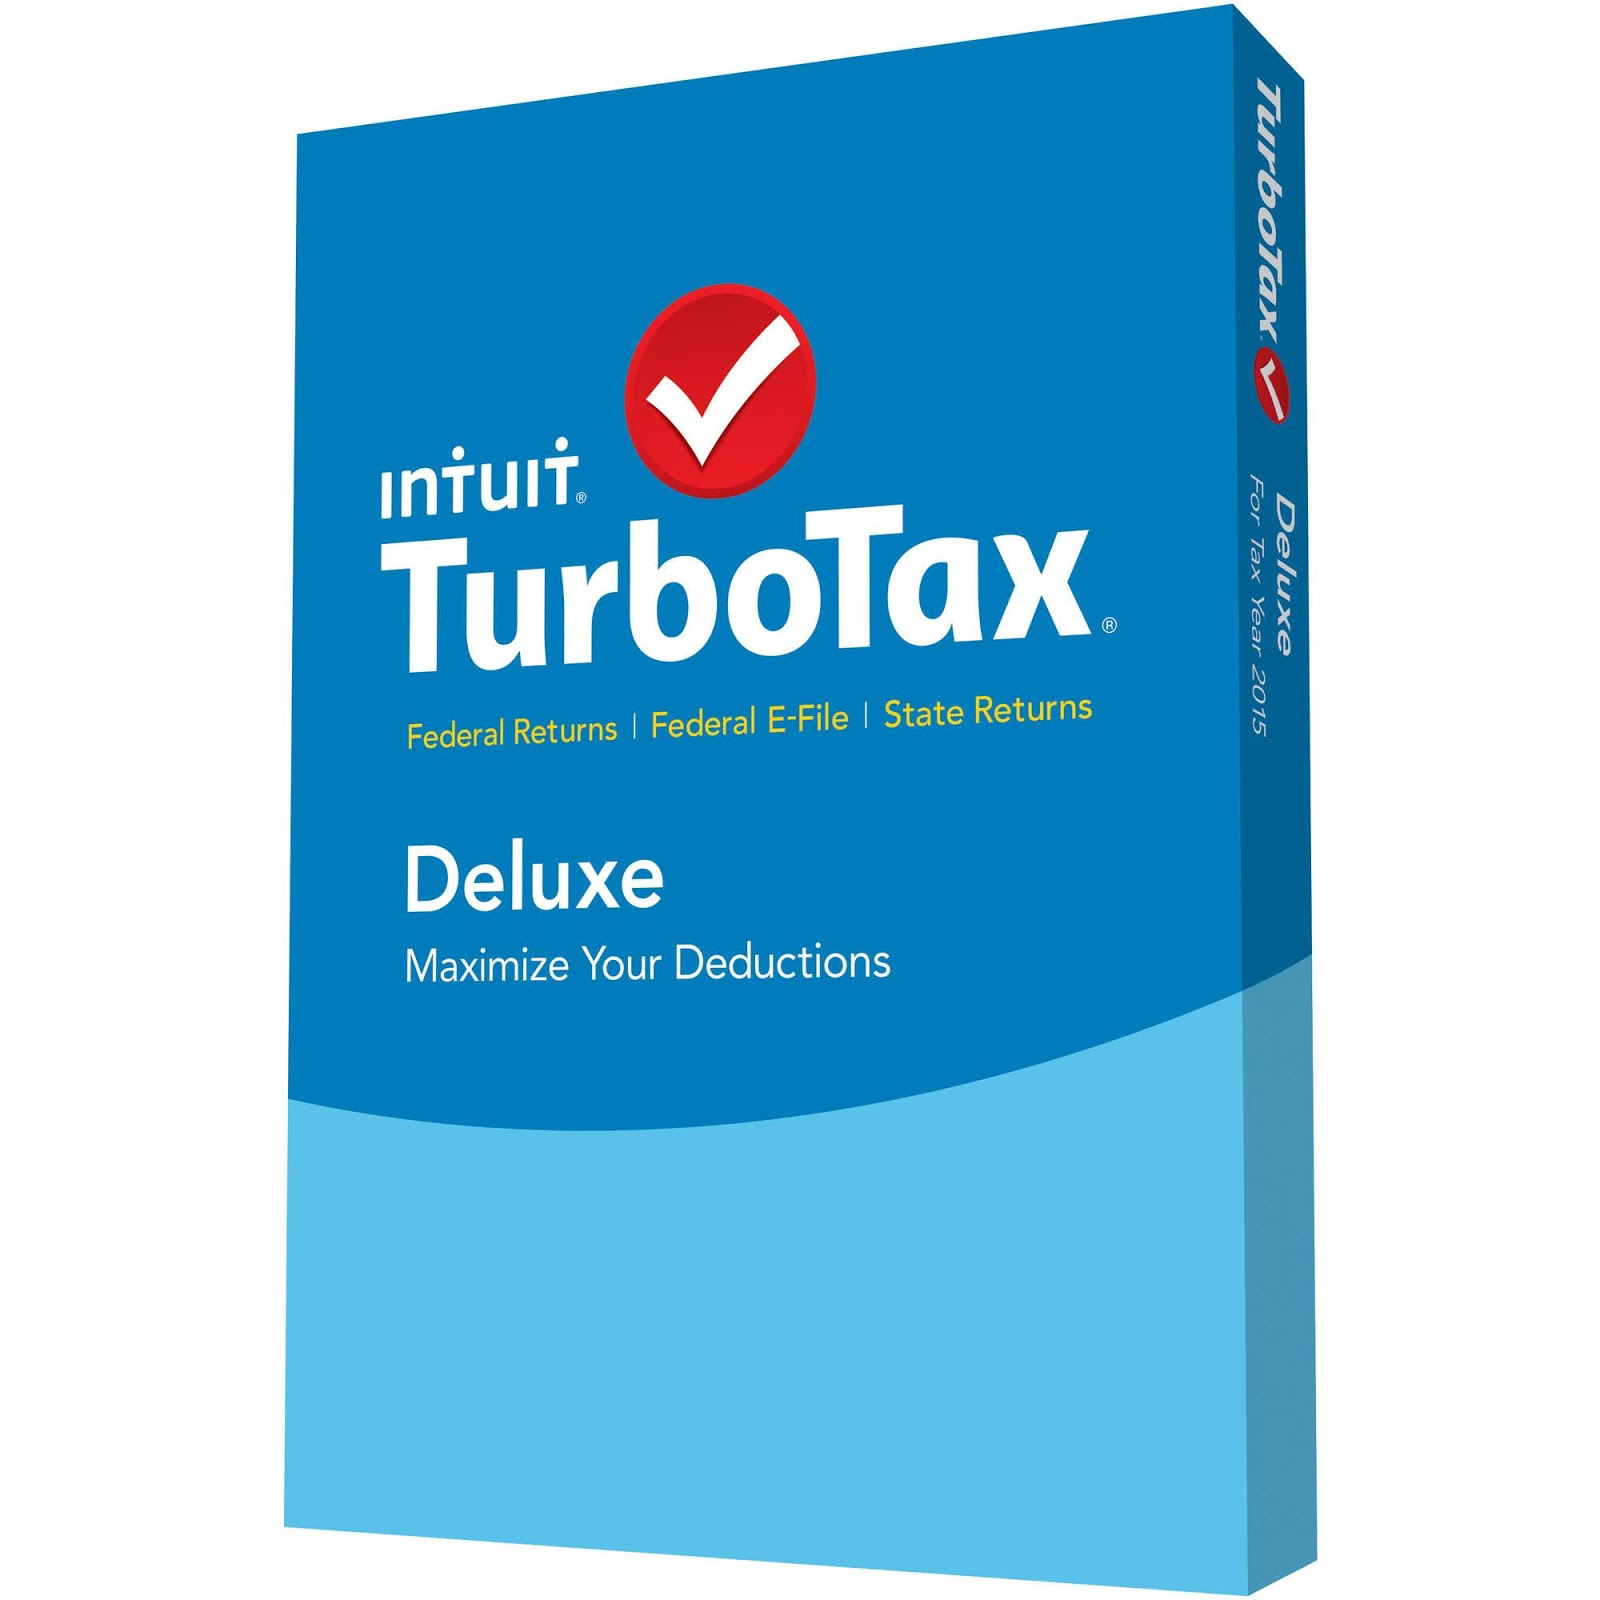 TurboTax 2018 cracked ALL EDITION (WIN-MAC),TurboTax 2018 Canada